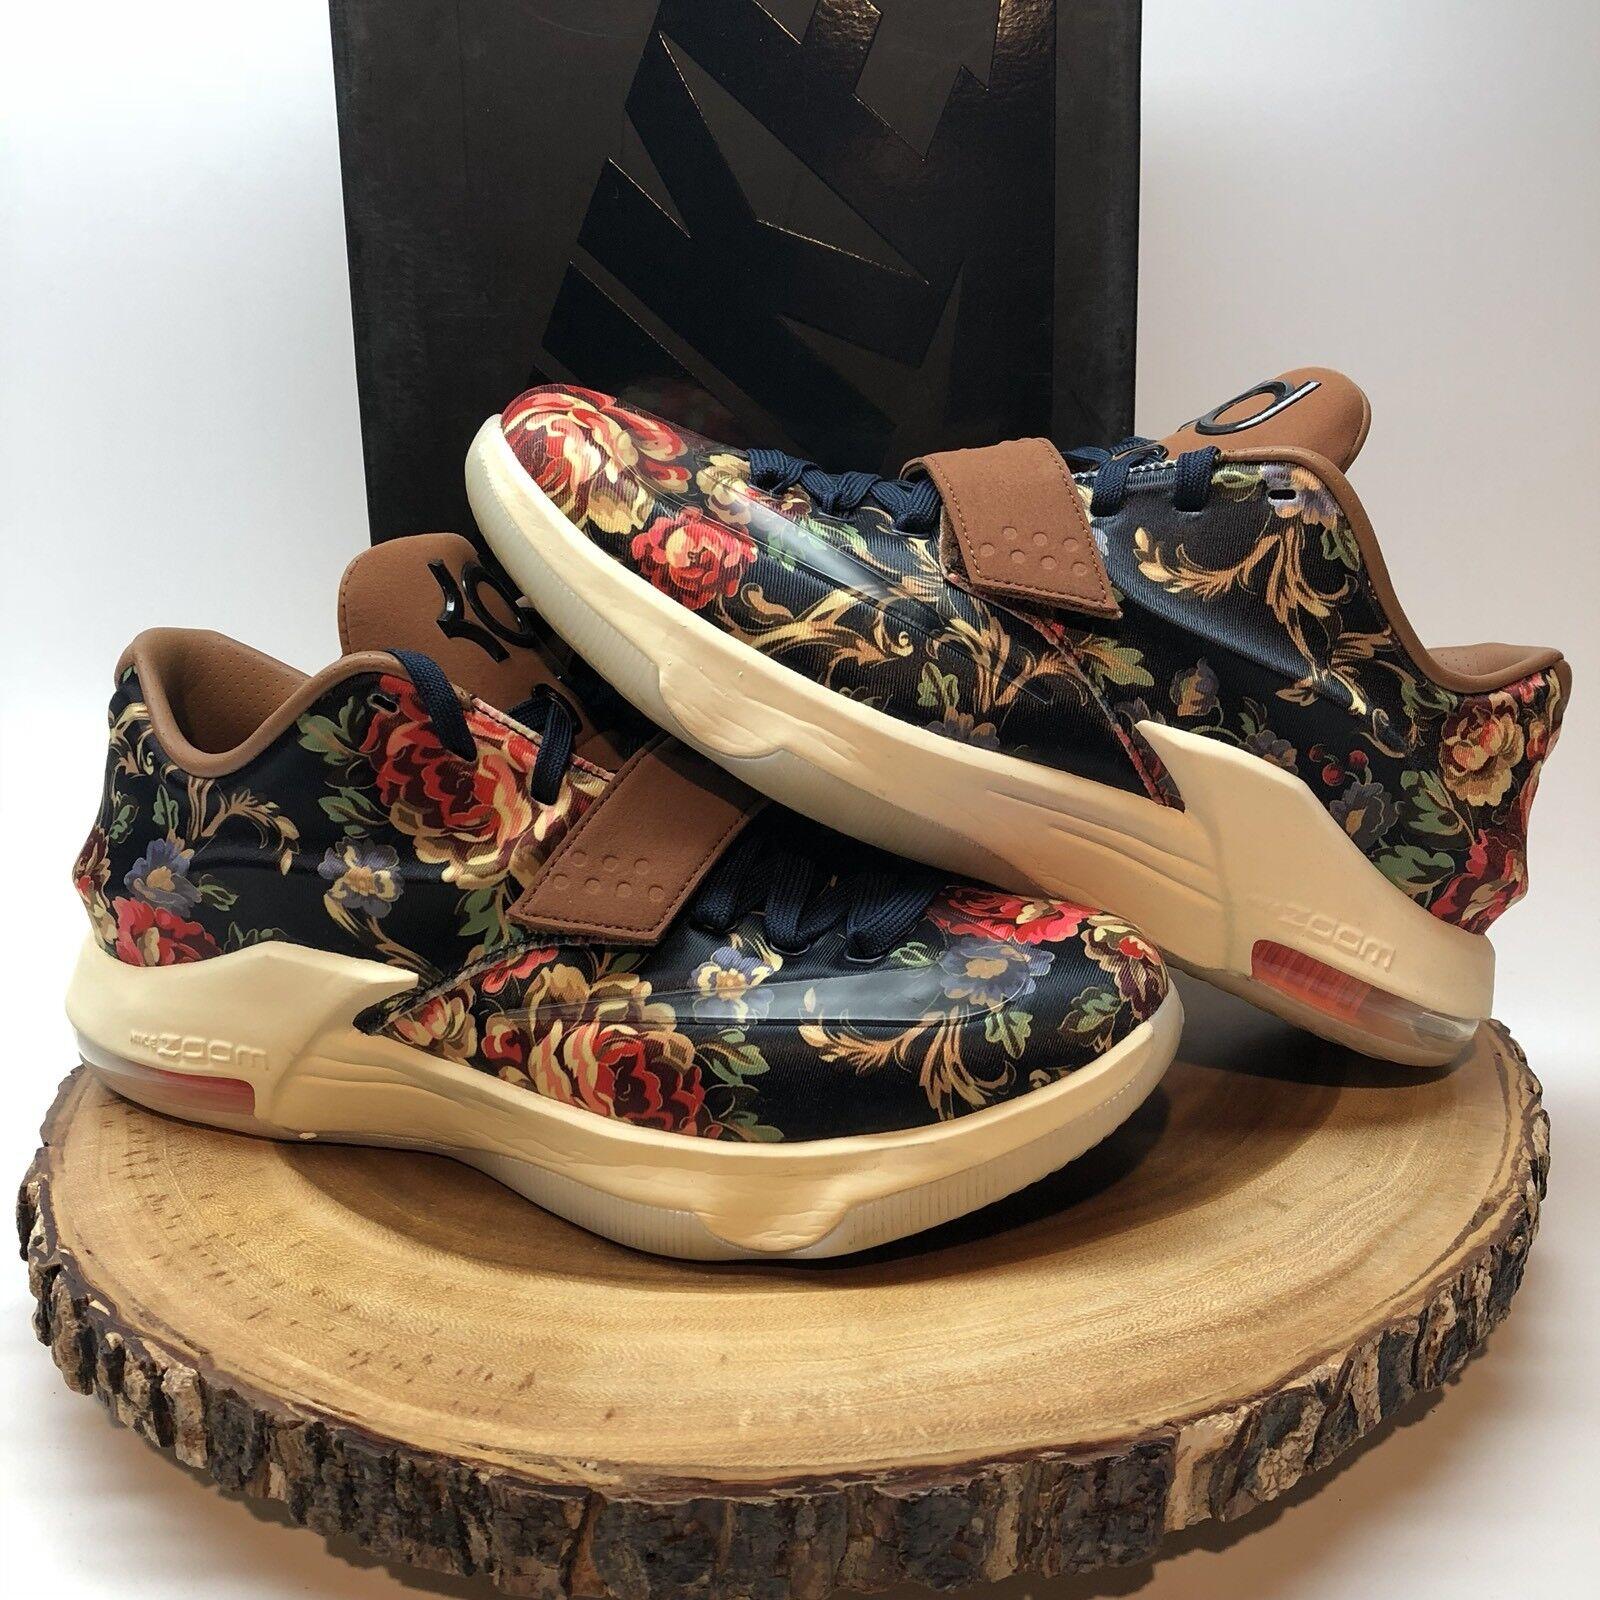 Nike KD VII ext floral QS Midnight Navy / Negro-hazelnut baratos 726438-400 tamaño 10 LeBron baratos Negro-hazelnut zapatos de mujer zapatos de mujer b5950b